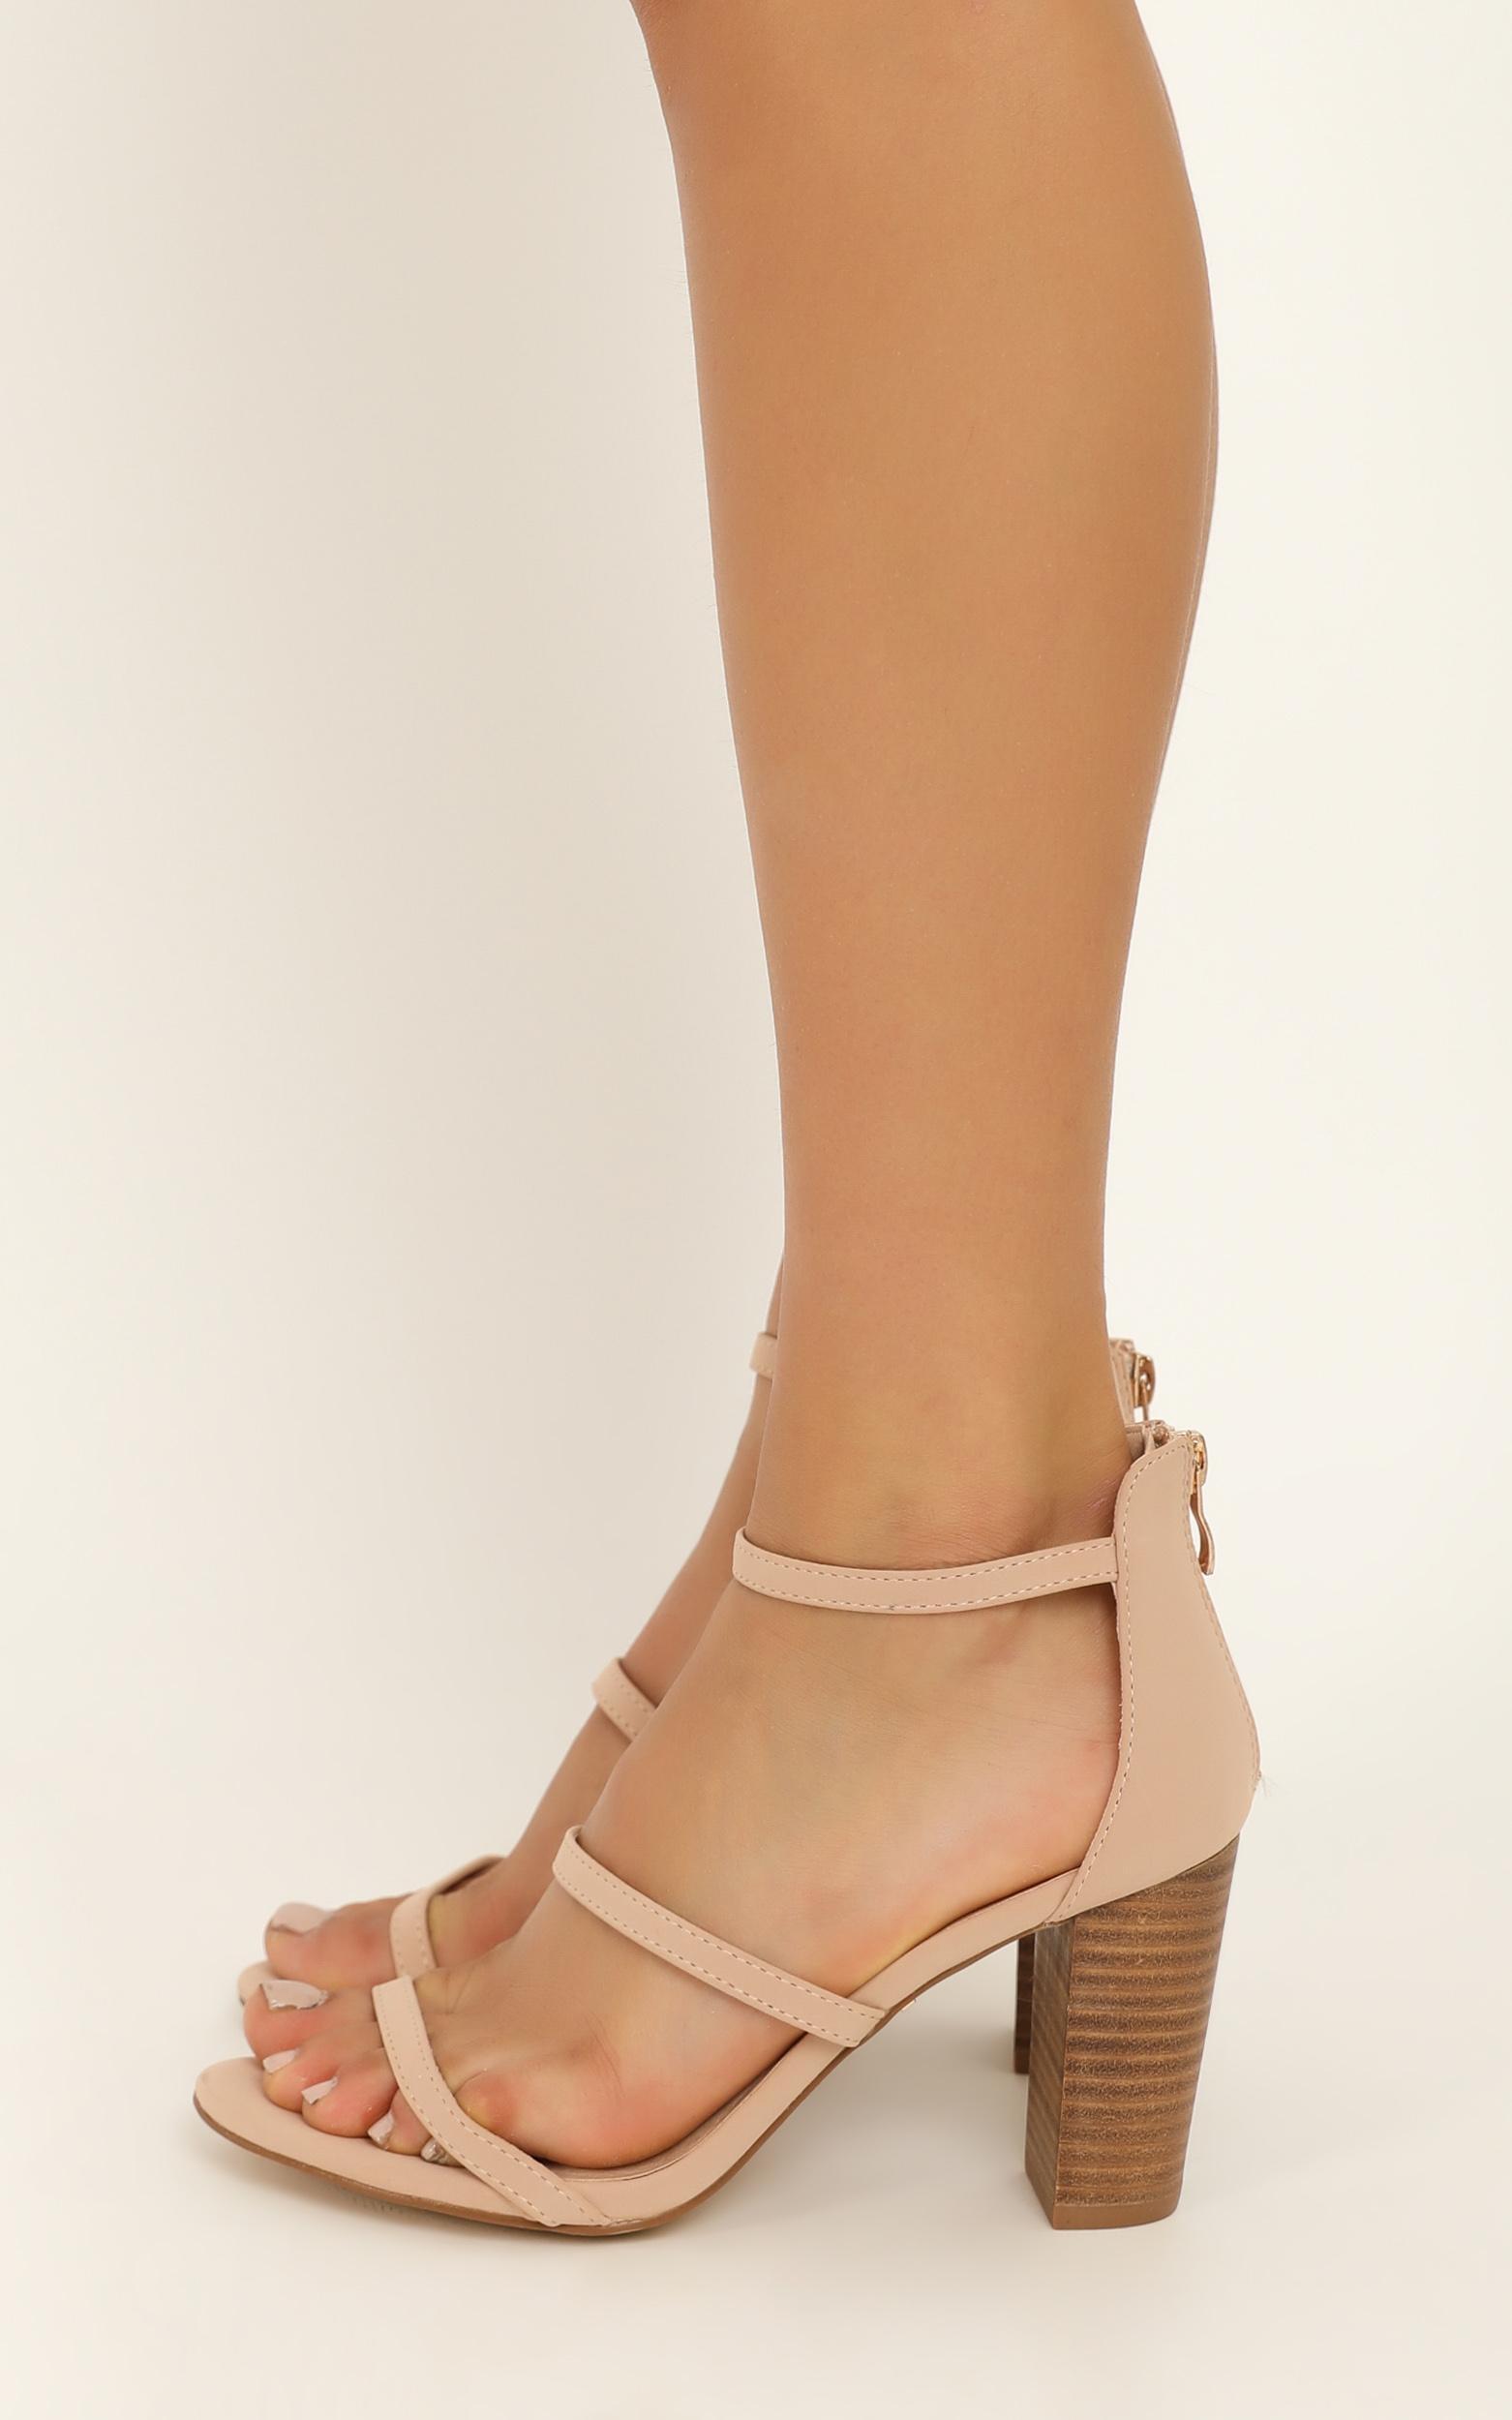 Billini - Dallas heels in nude nubuck - 5, Neutral, hi-res image number null